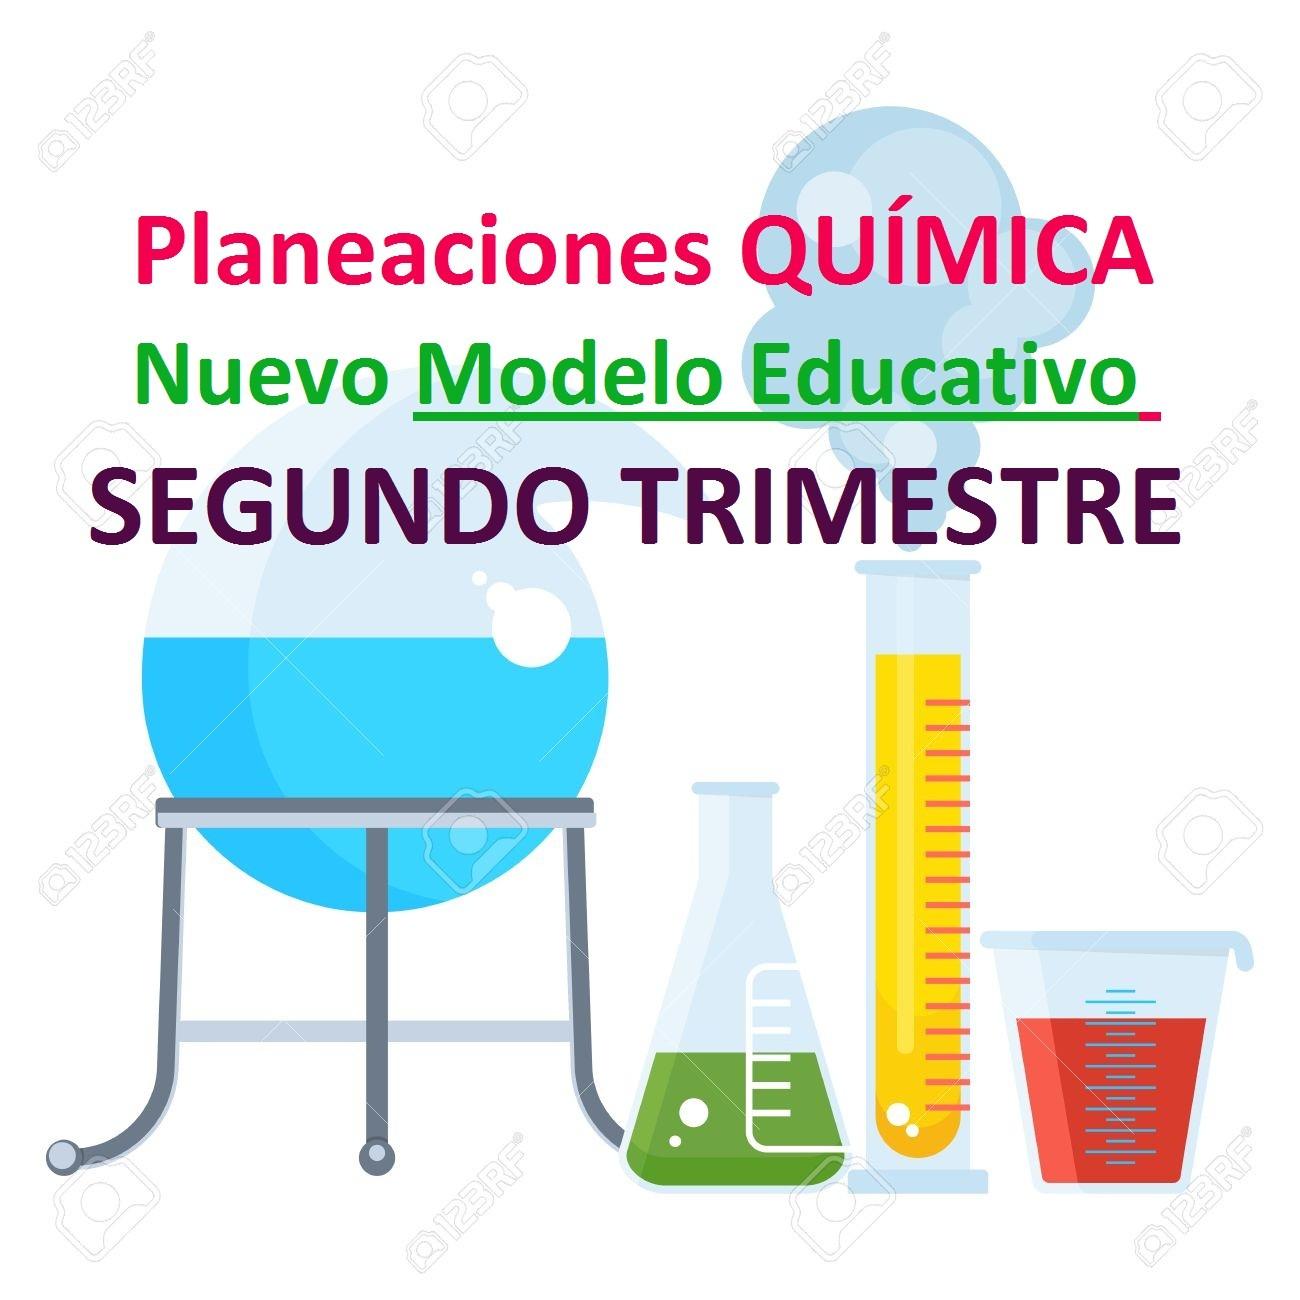 planeaciones quimica segundo trimestre